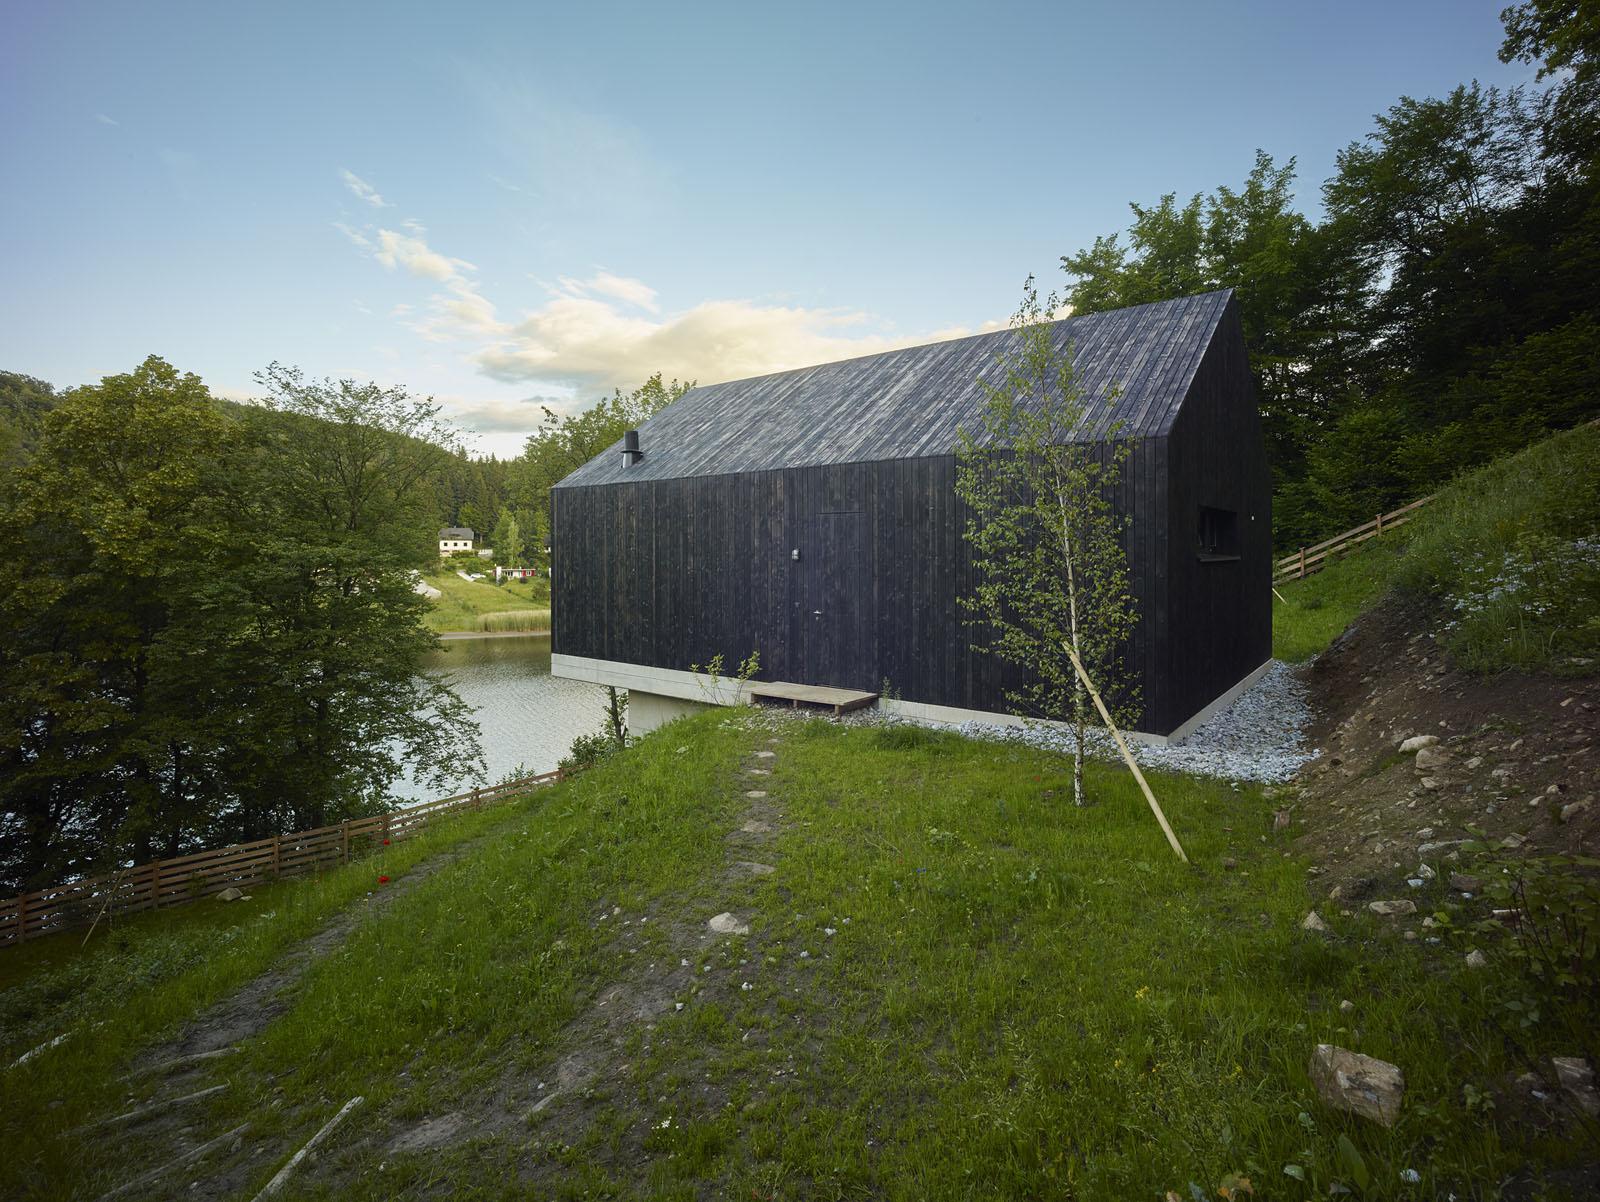 Backraum Architektur - Dům u jezera Thurnberg